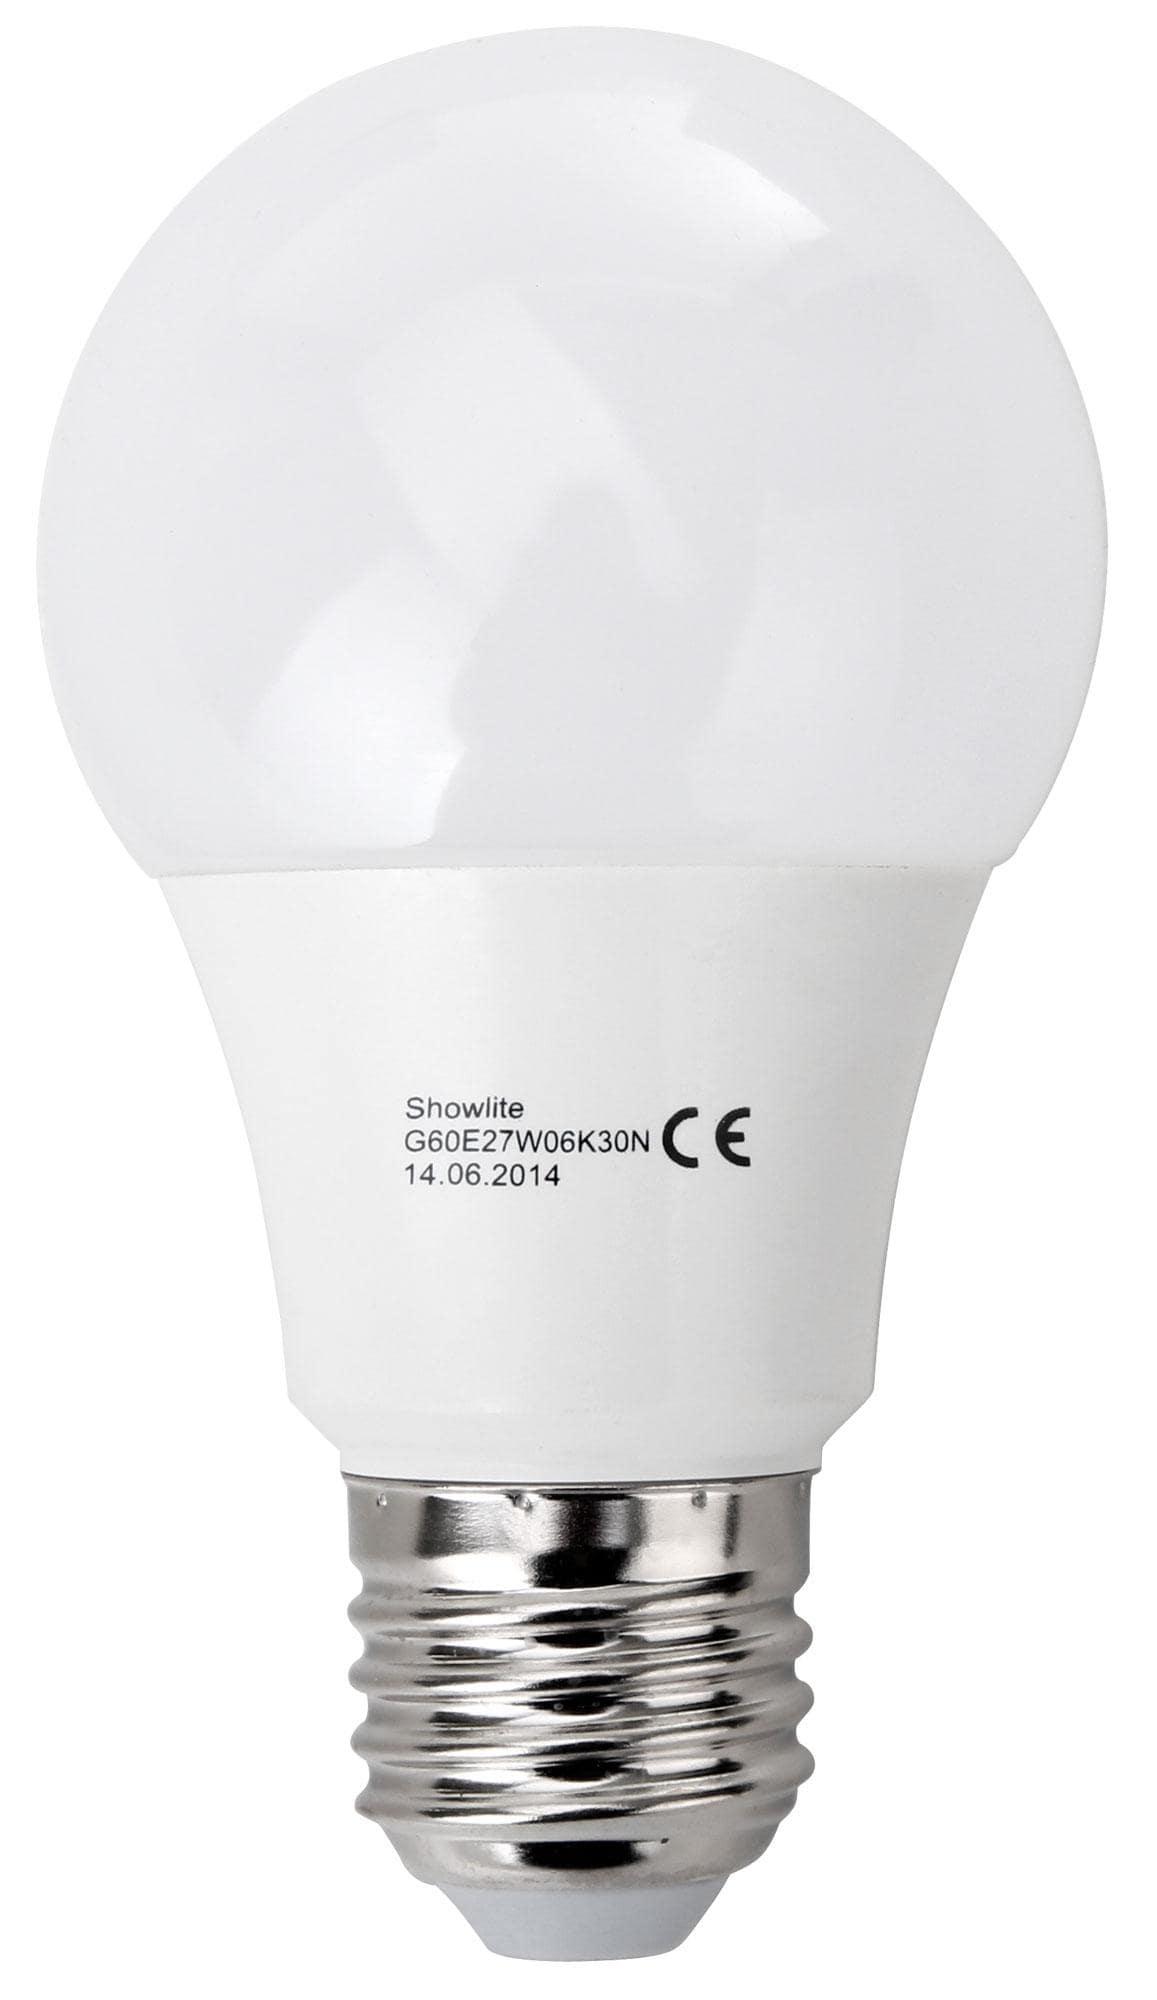 showlite led bulb g60e27w06k30n 6 watt 480 lumen e27 3000 kelvin. Black Bedroom Furniture Sets. Home Design Ideas